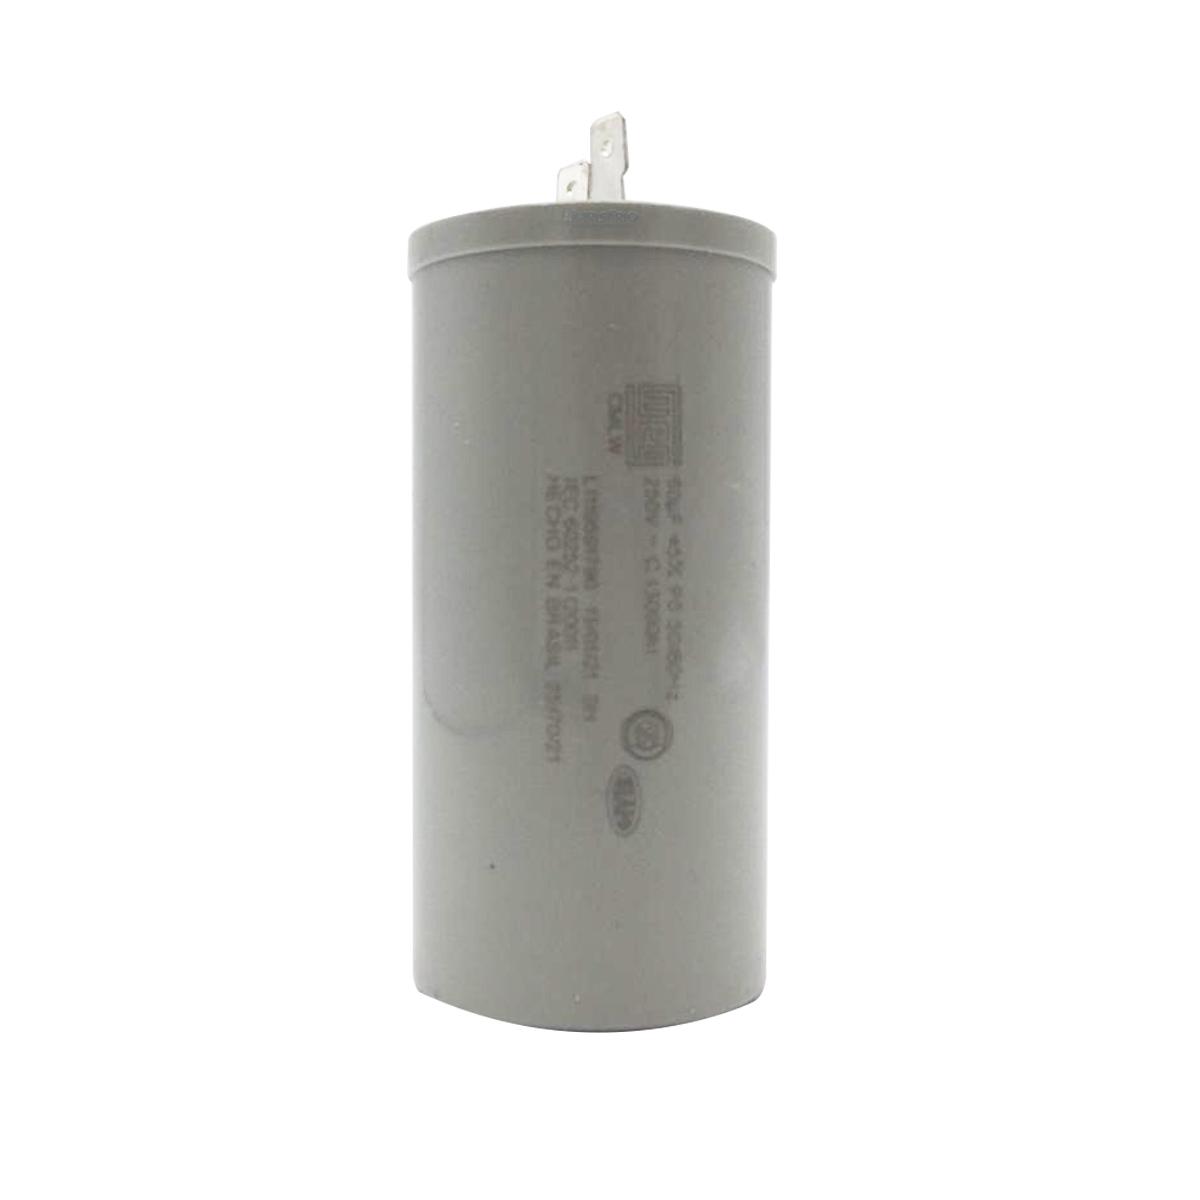 Capacitor 60mf 250v